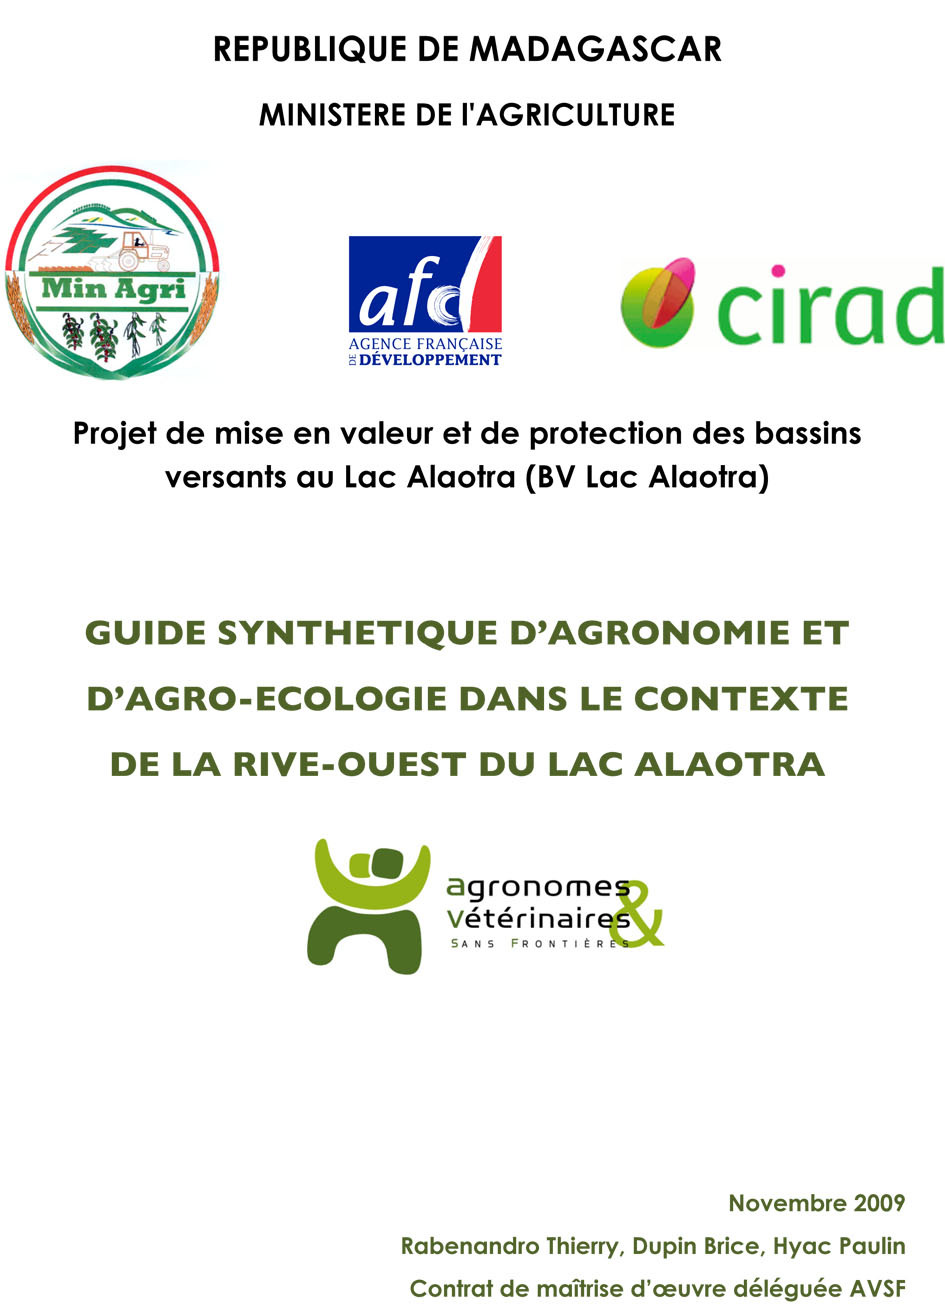 Thumbnail - Guide synthétique d'agroécologie au Lac Alaotra (Madagascar)